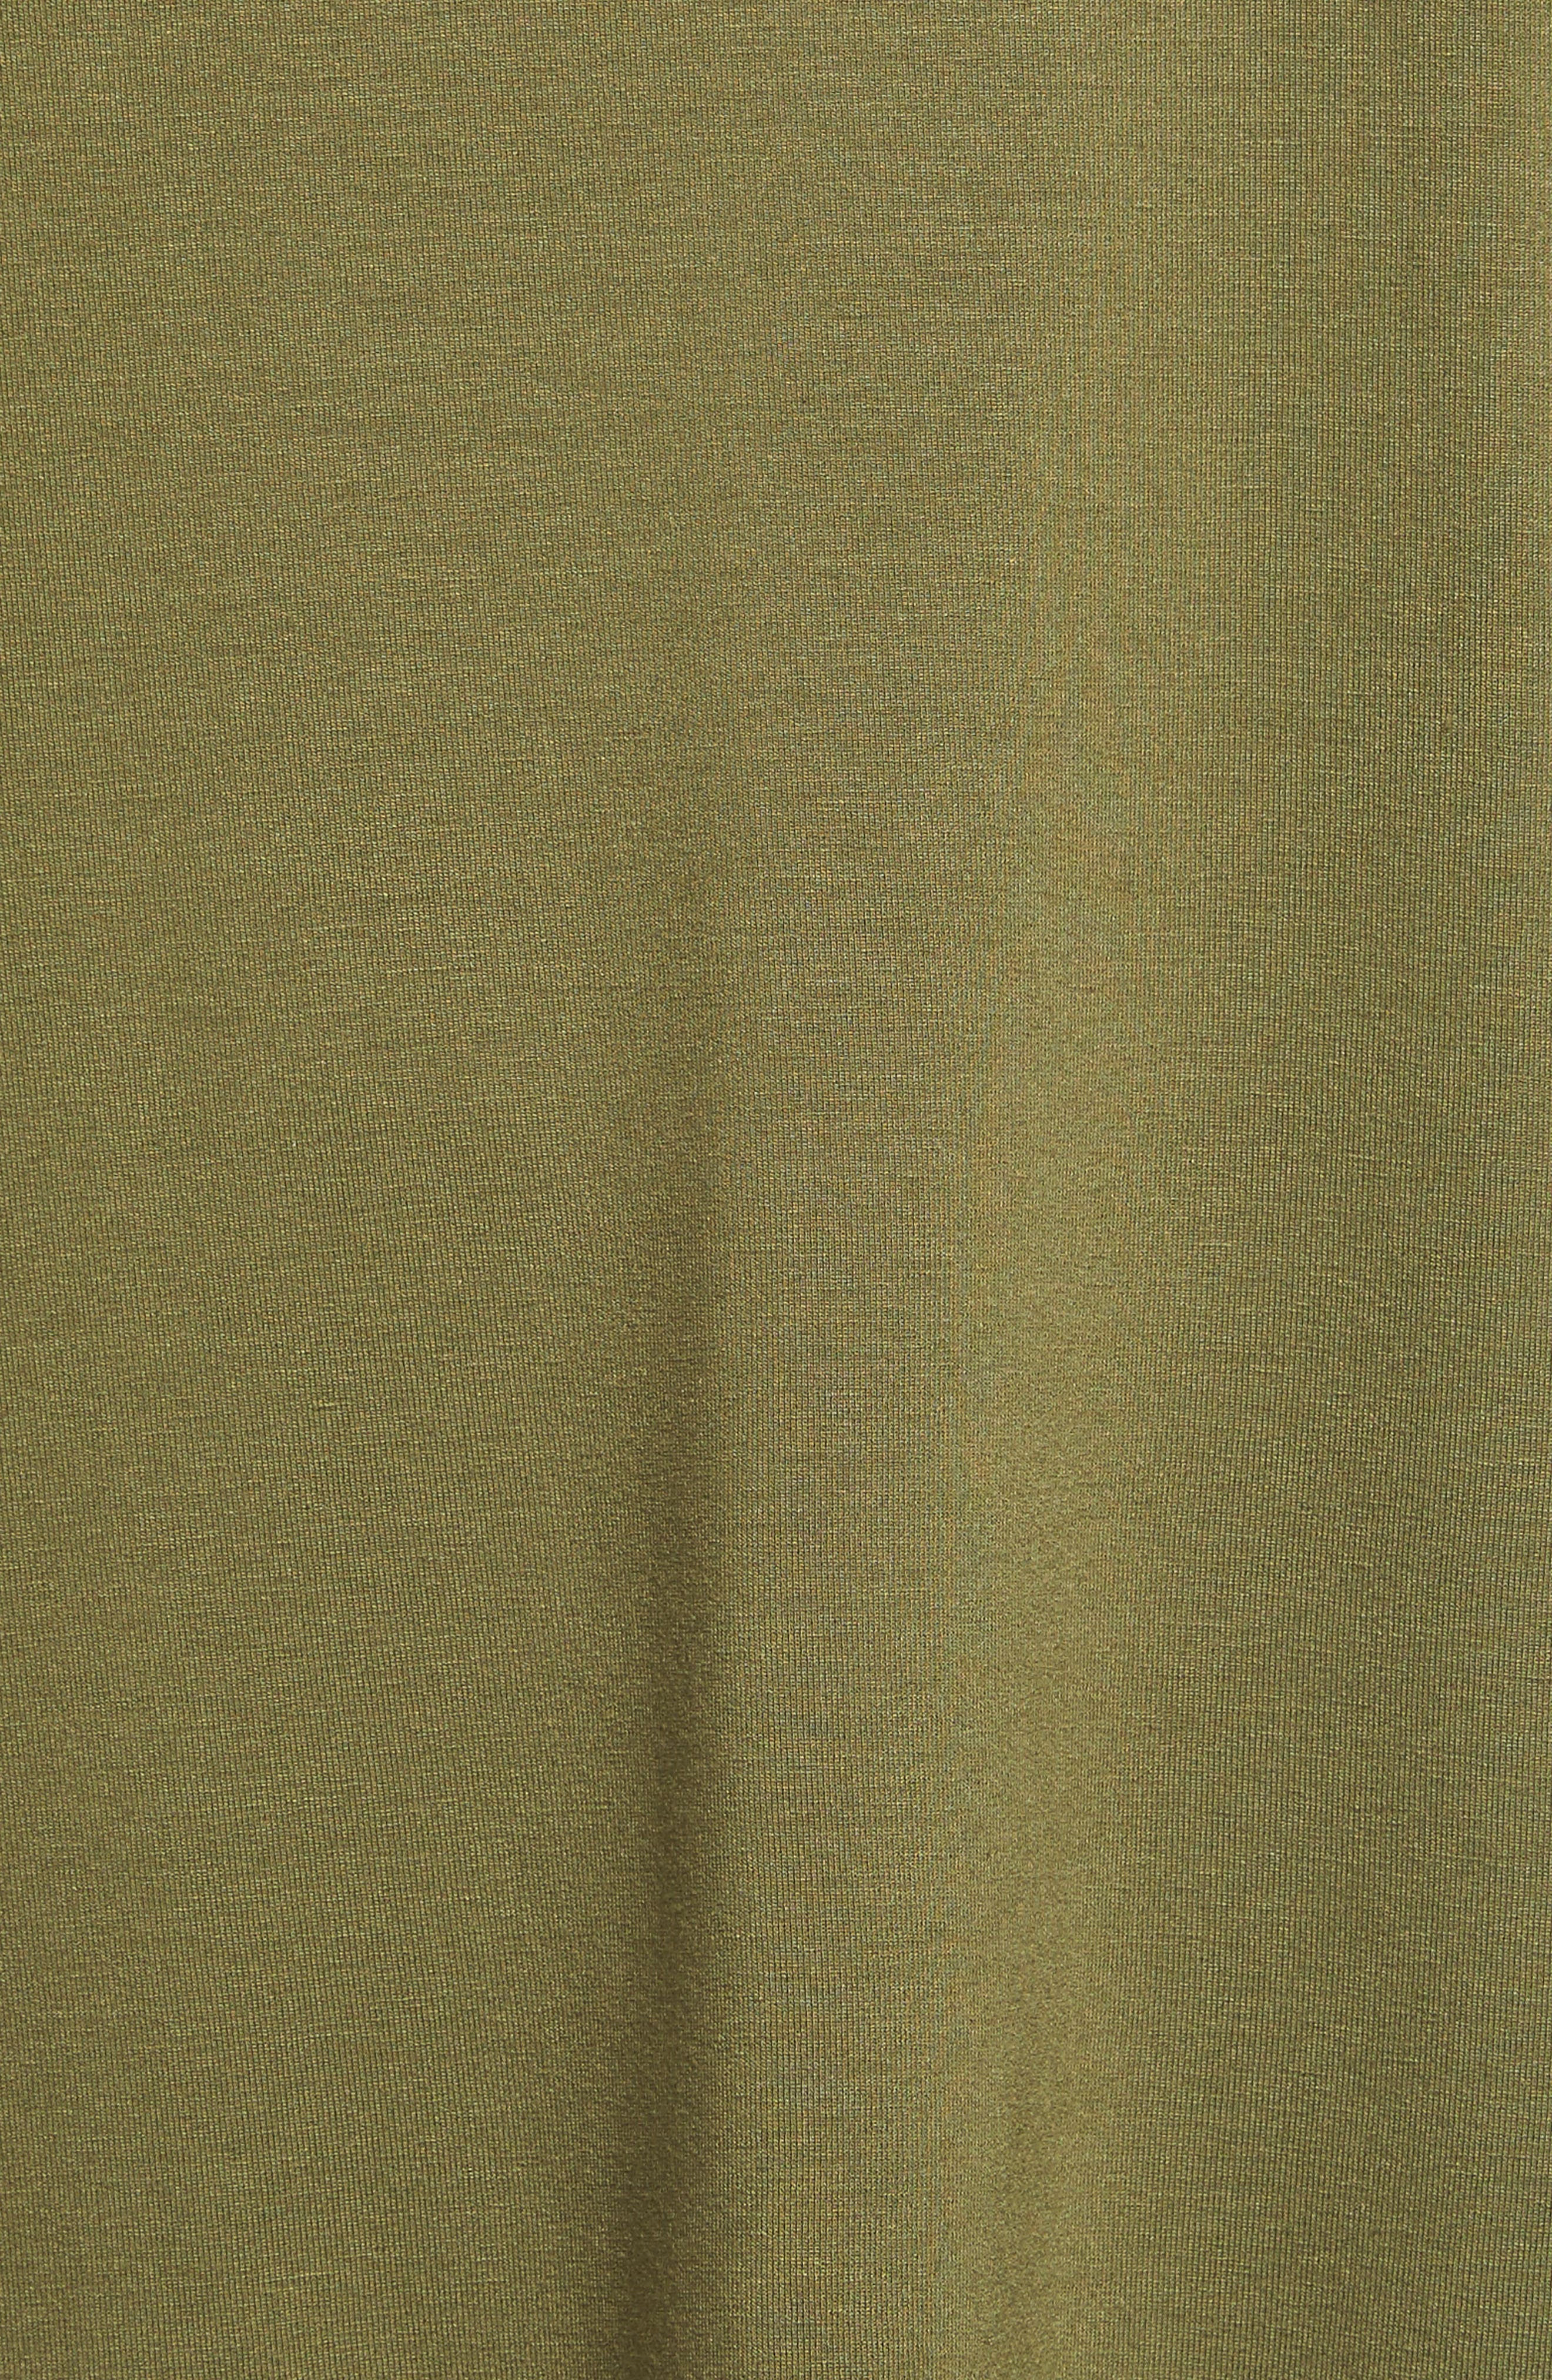 Alternate Image 5  - Eileen Fisher Jersey Scoop Neck Long Tank (Regular & Petite)